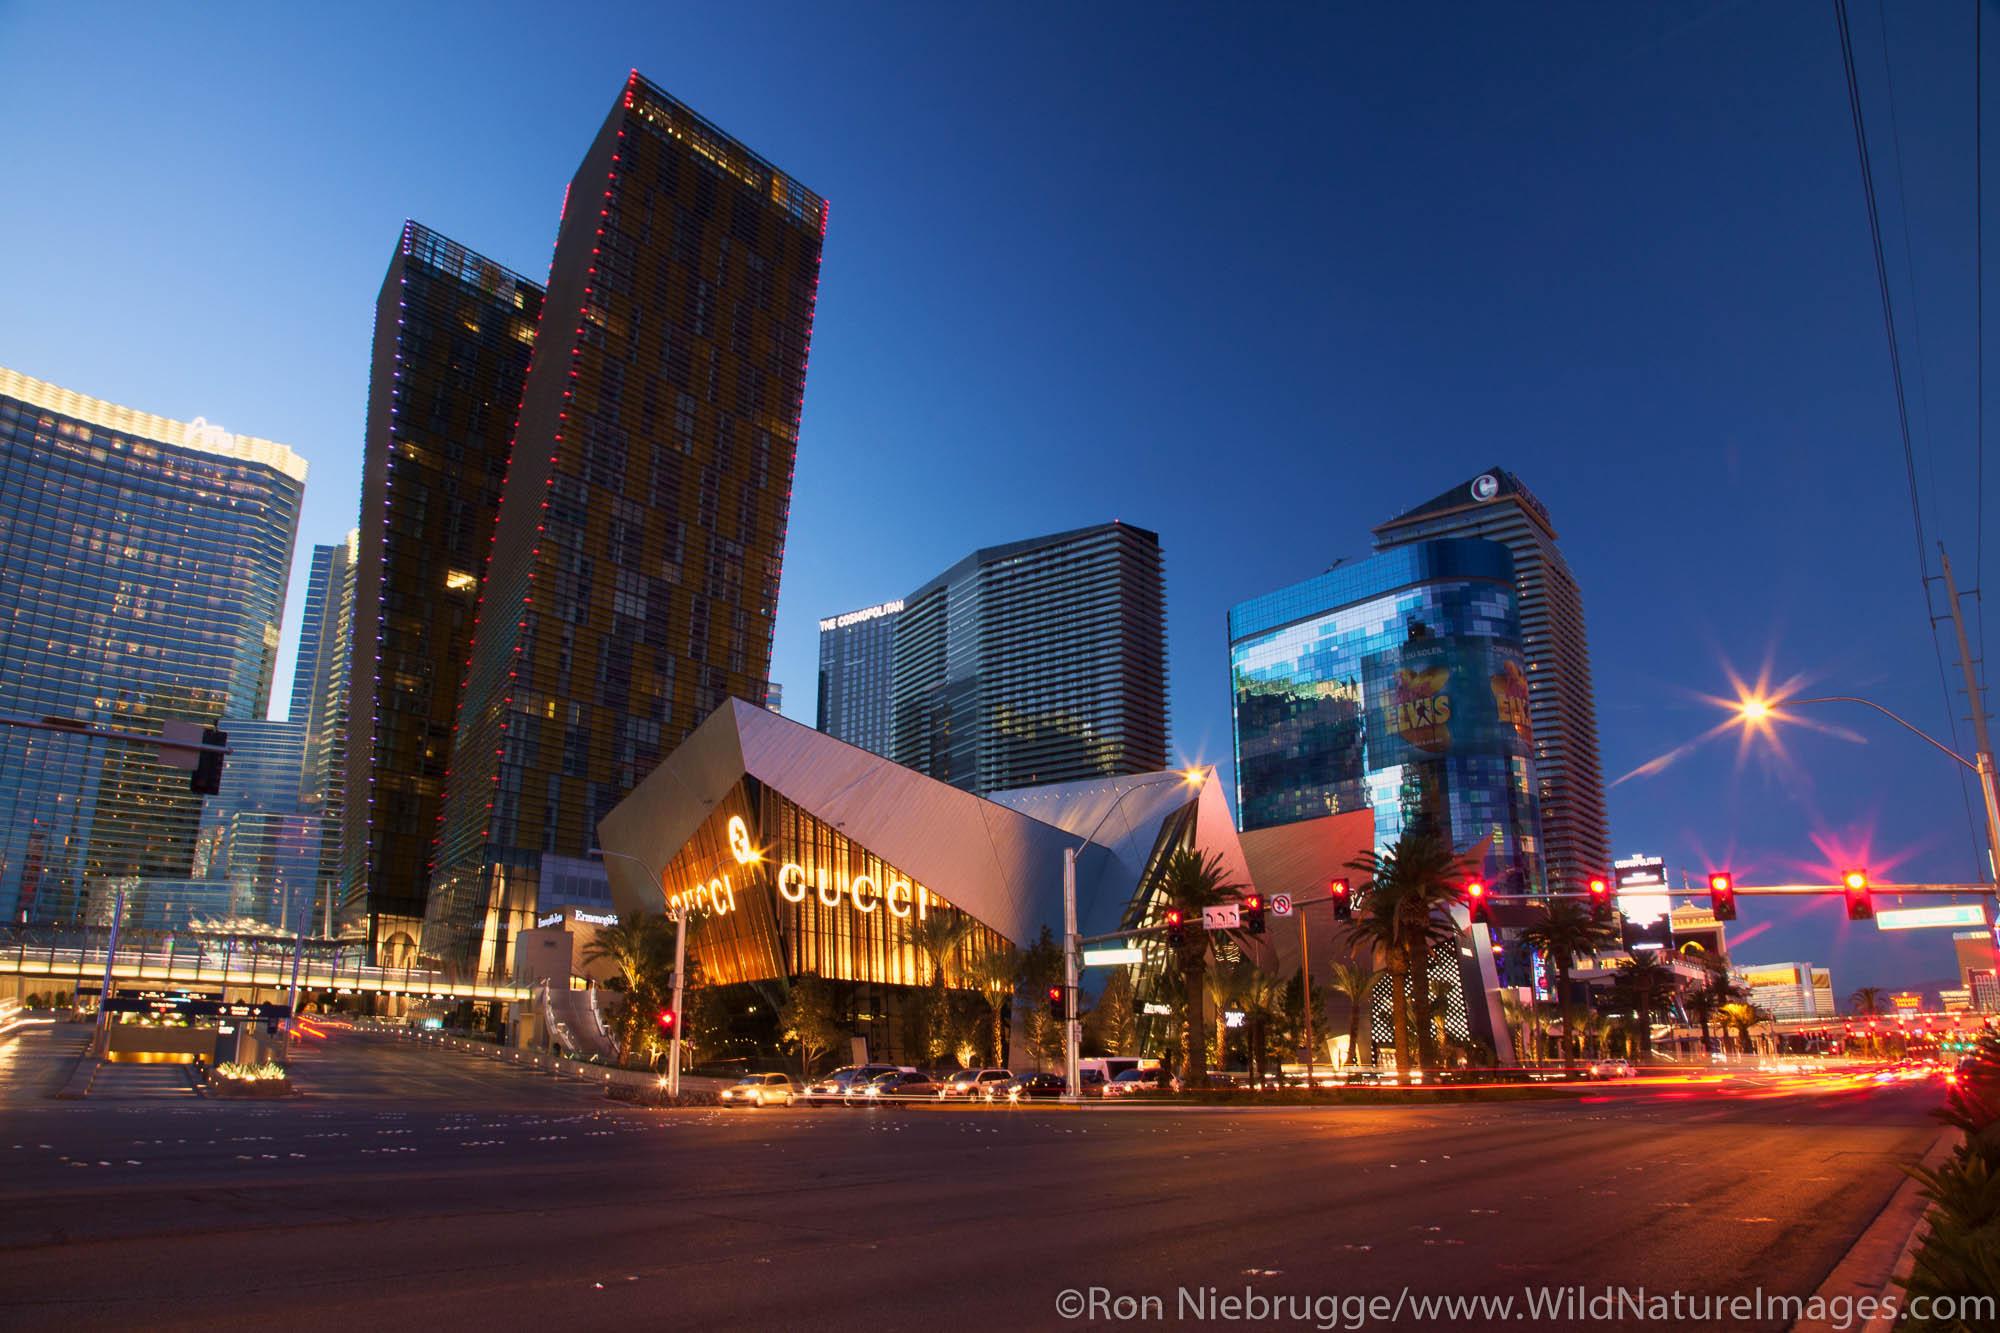 Crystals and CityCenter, Las Vegas, NV